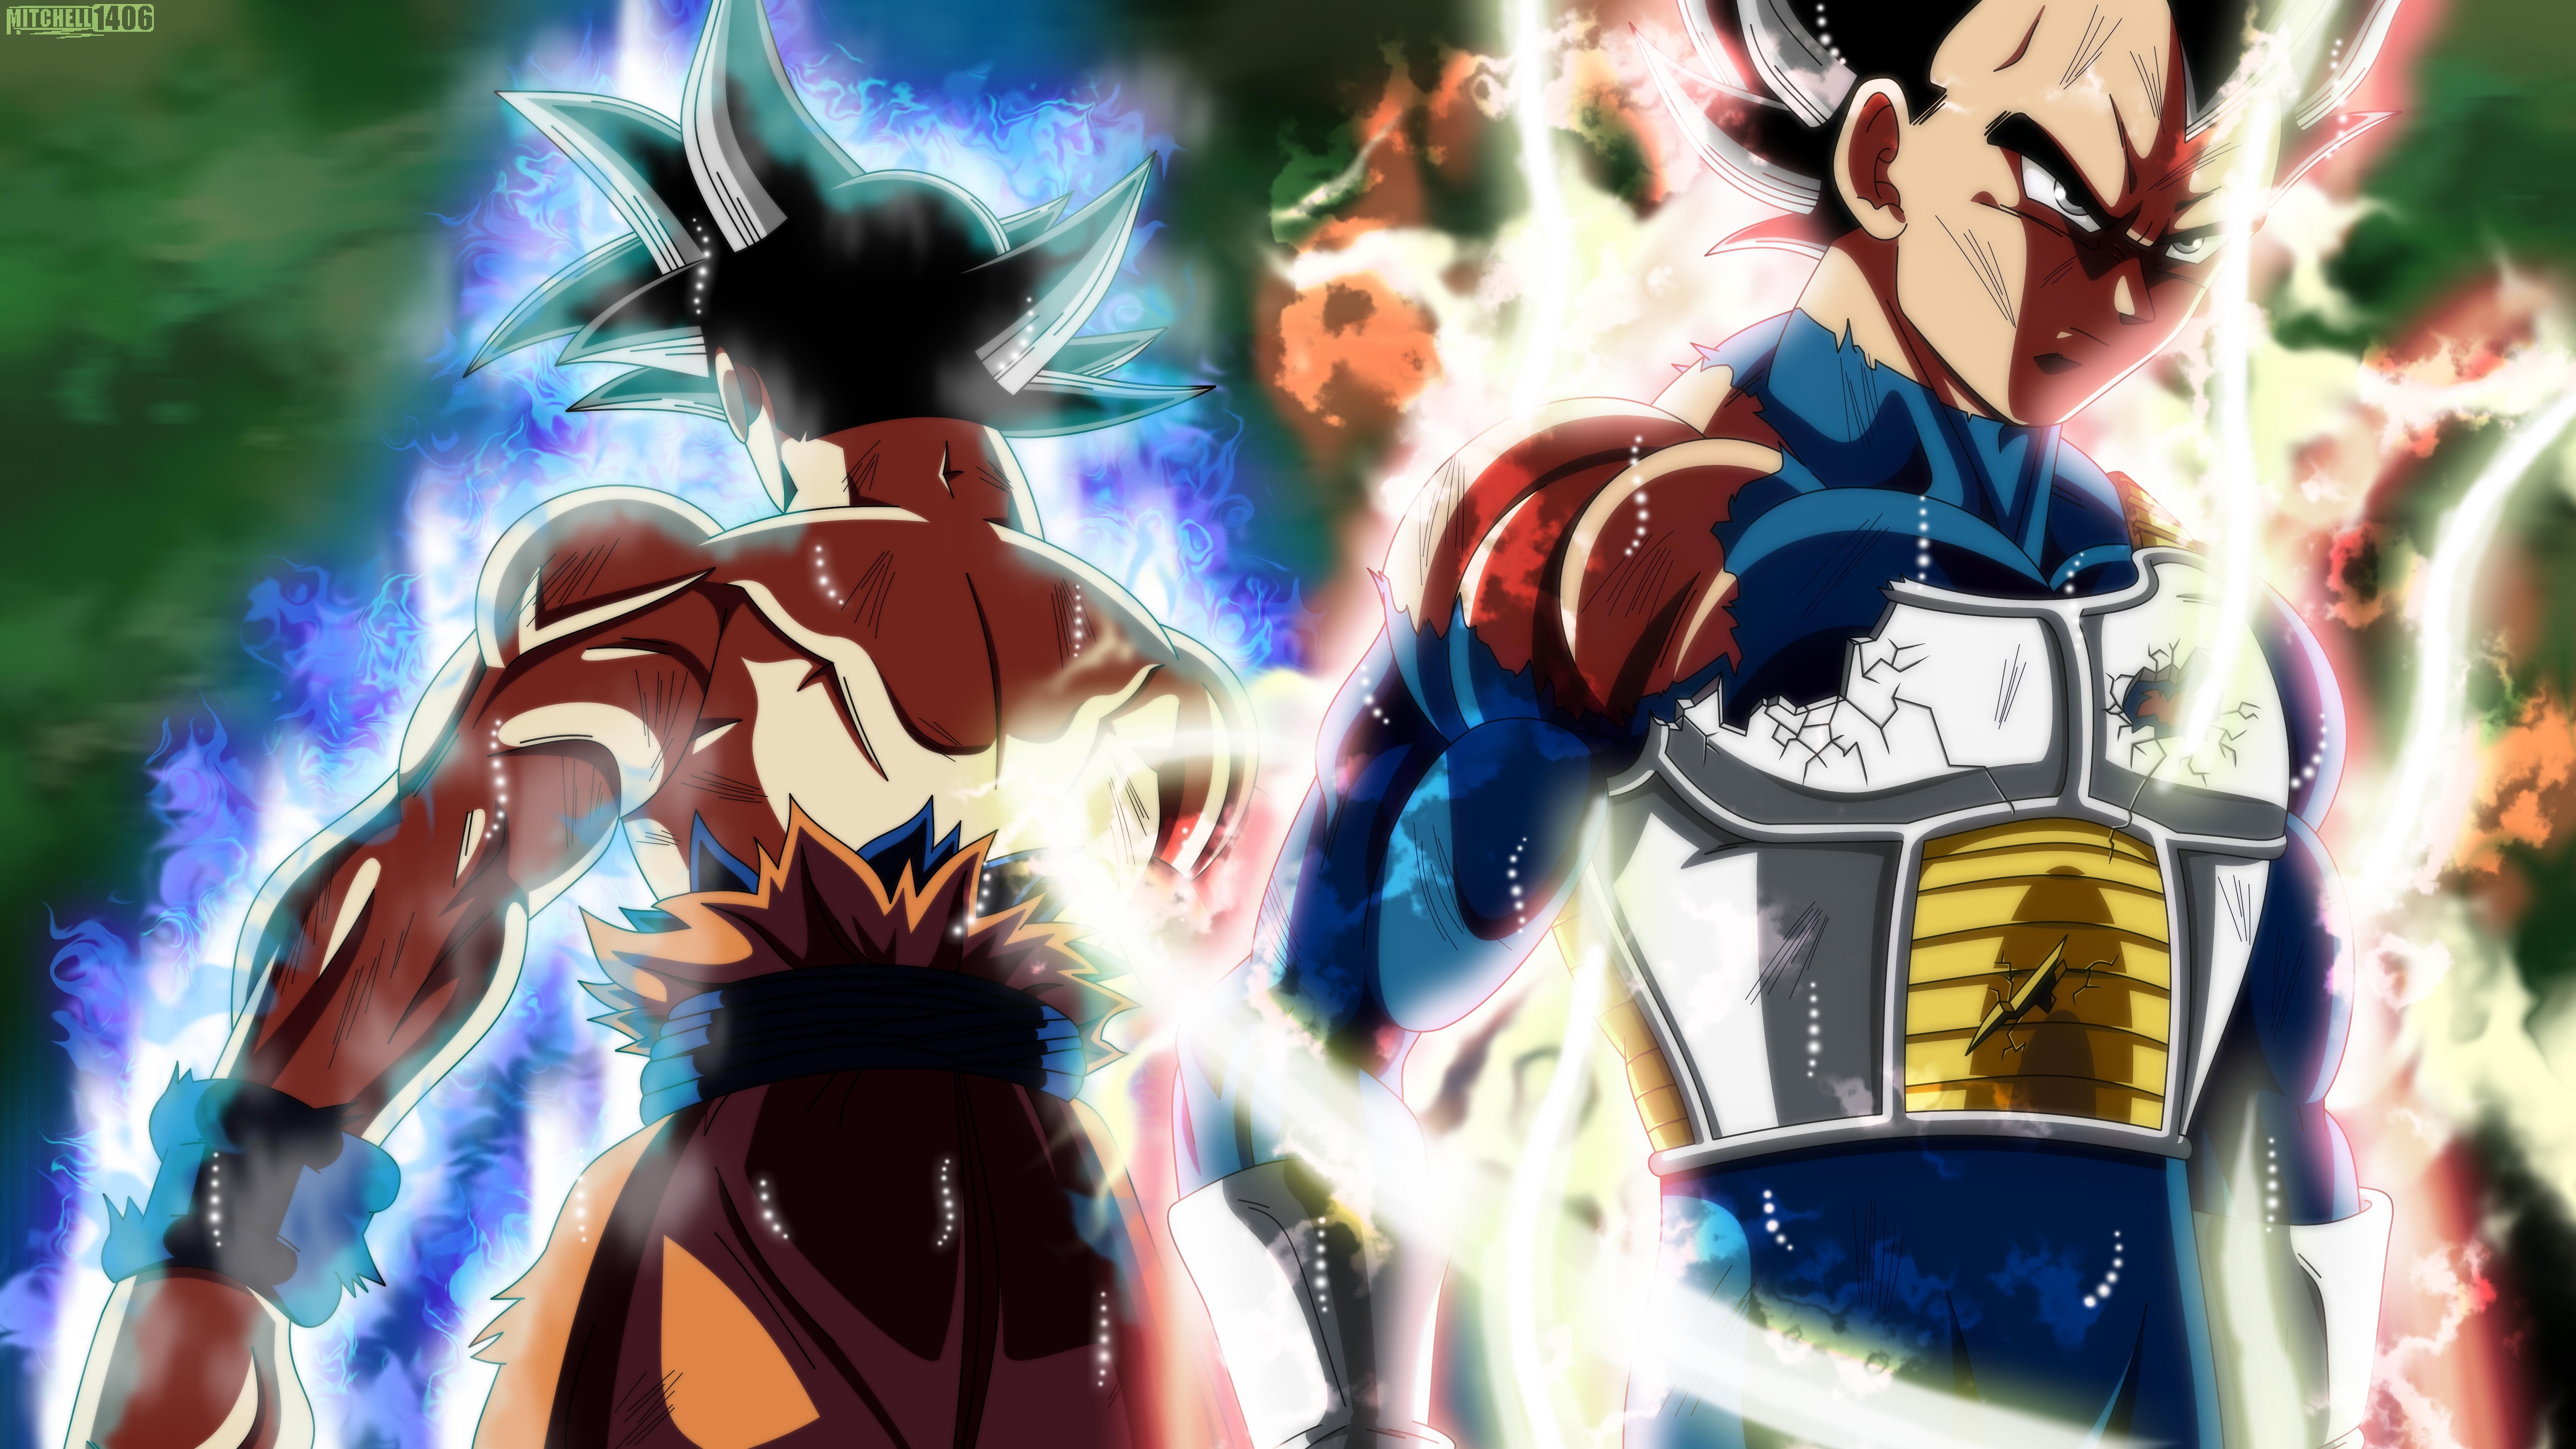 Goku And Vegeta Ultra Instinct Wallpapers Wallpaper Cave